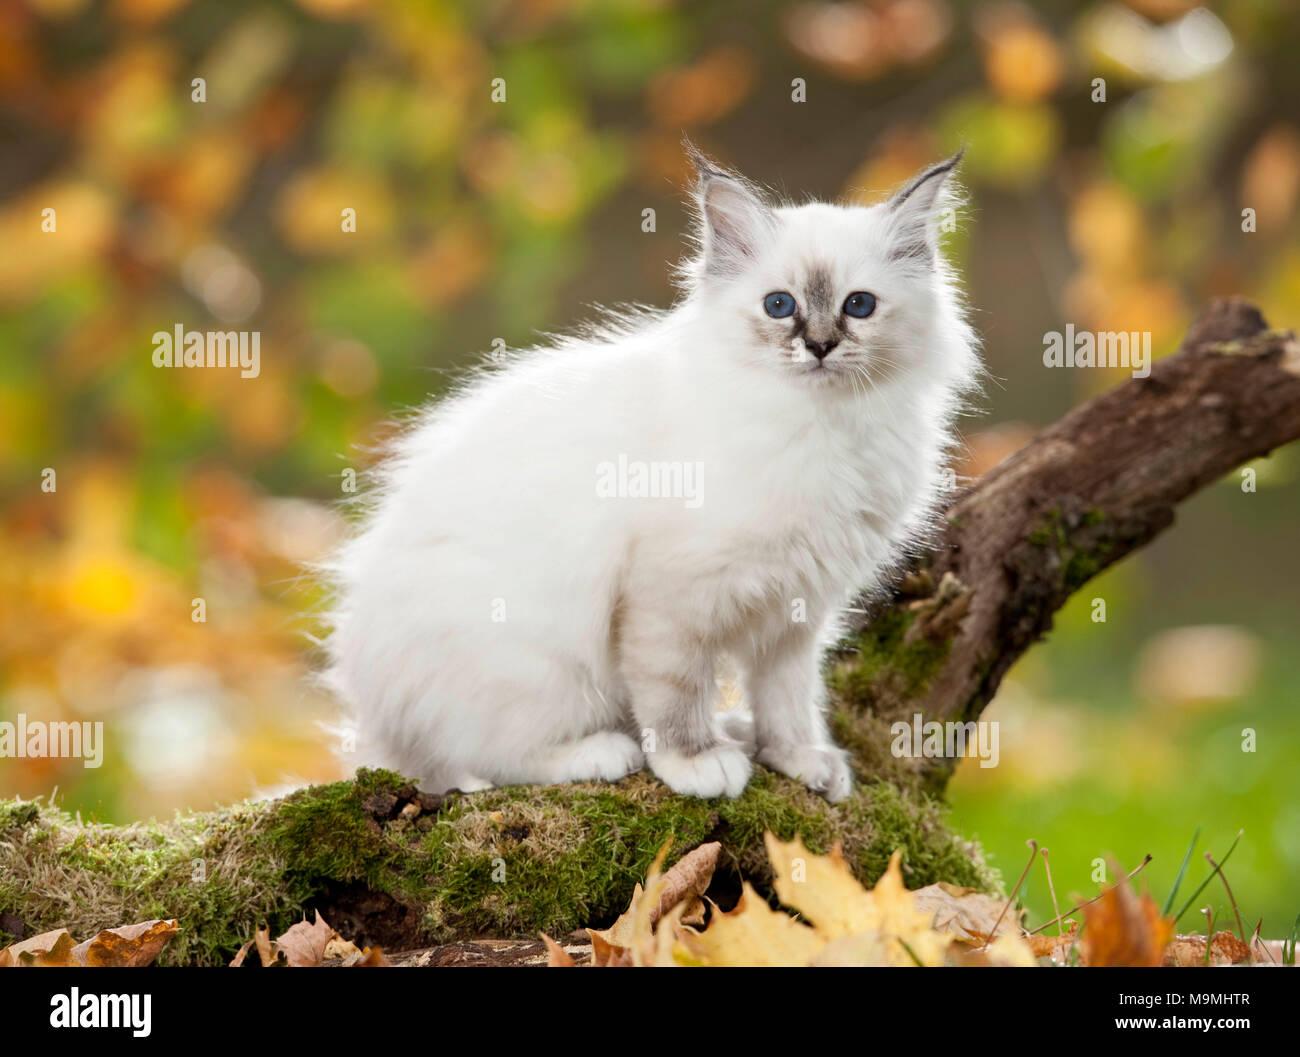 Sacred Birman. Kitten standing on a mossy log. Germany - Stock Image